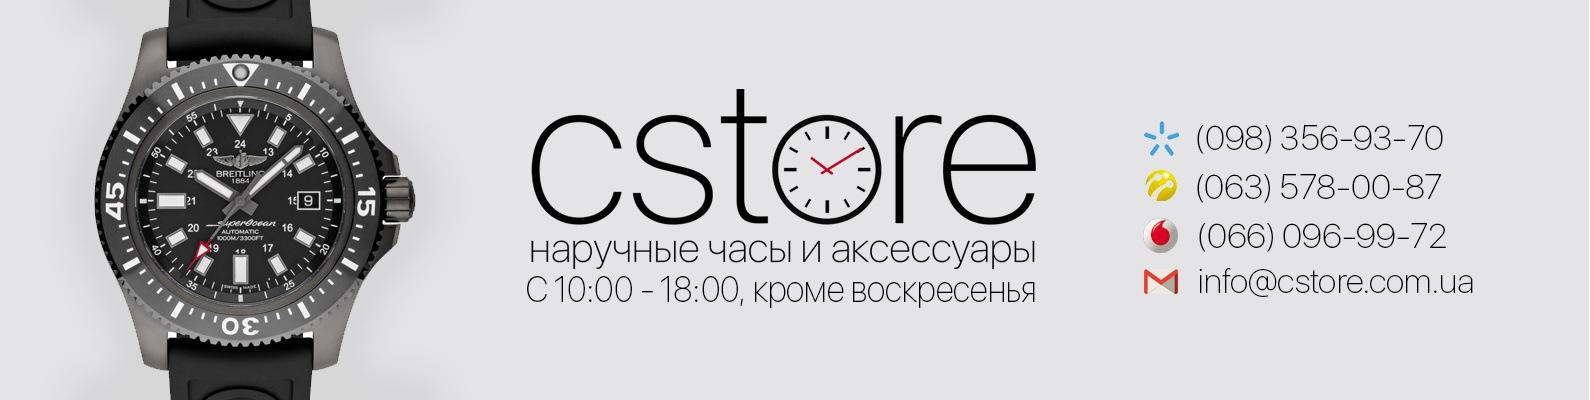 32a4fbc4 cstore.com.ua - наручные часы и акссесуары | ВКонтакте